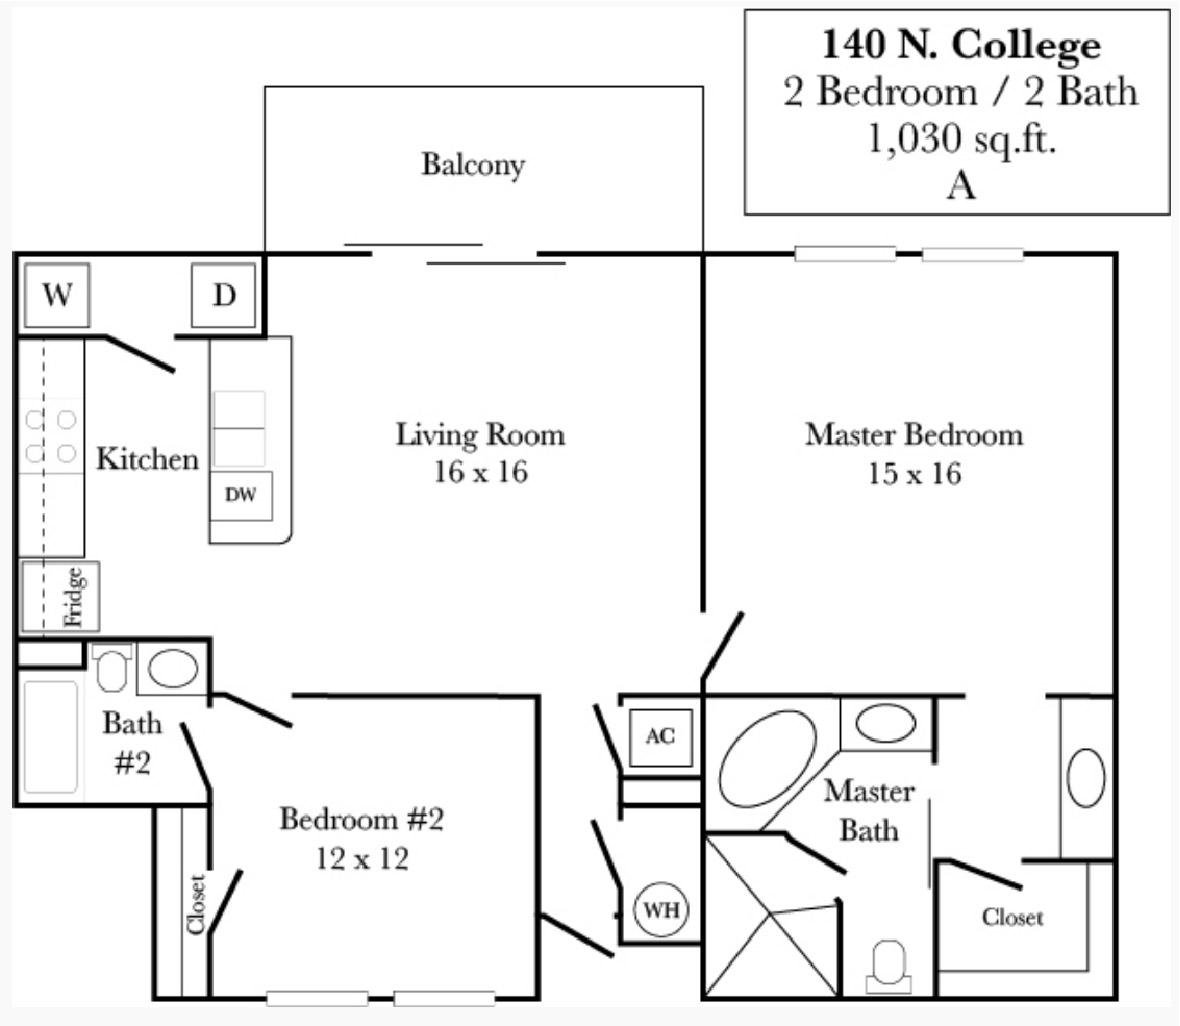 140 N. College - Plan A